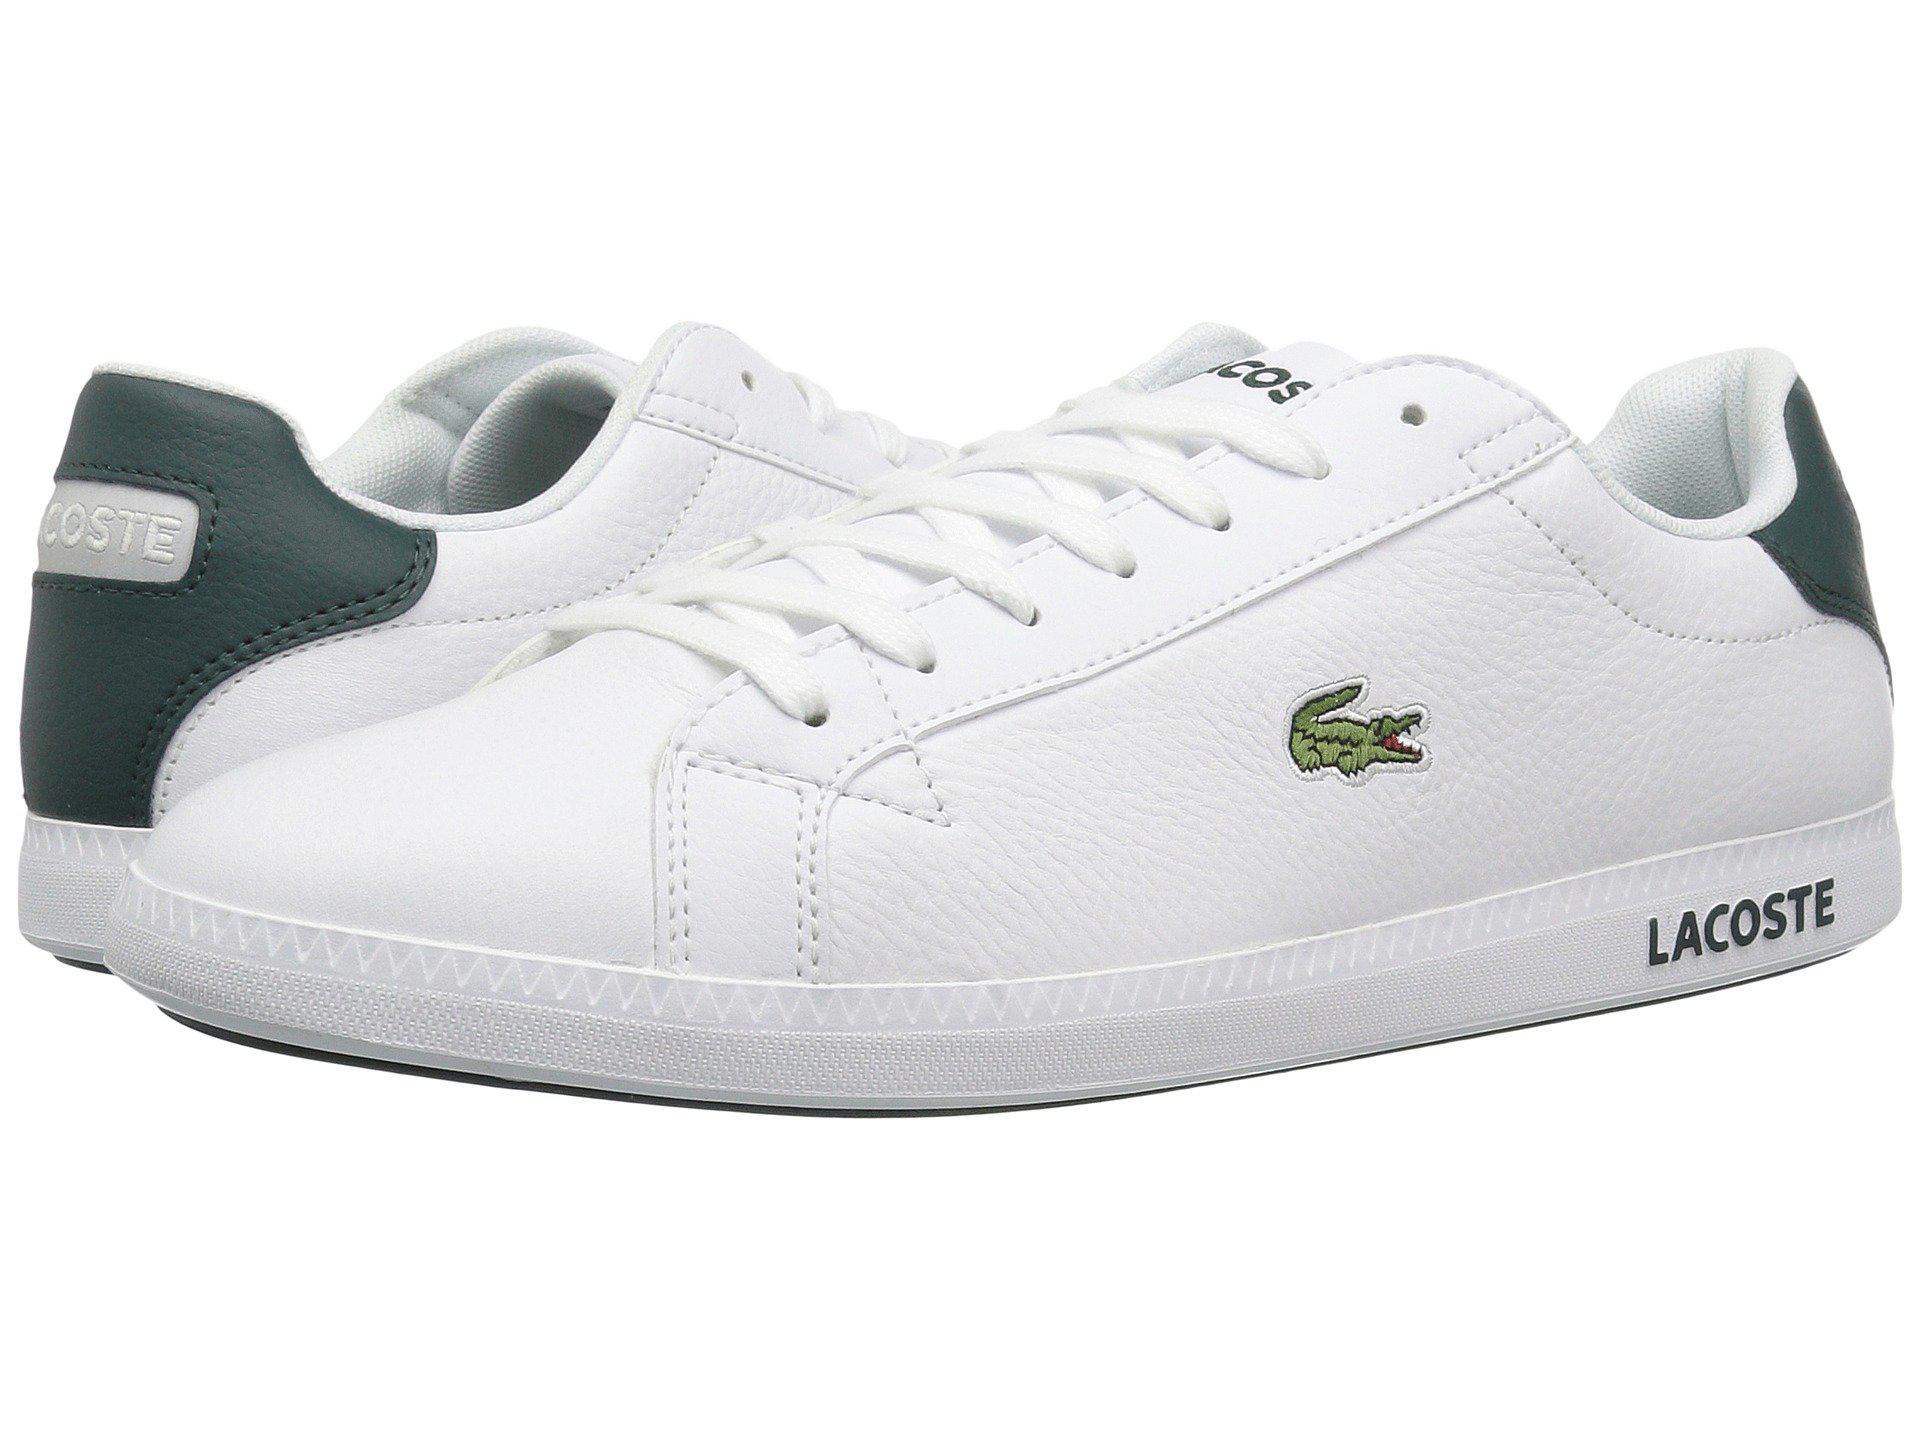 fe3067dc9c141 Lacoste - Graduate Lcr3 118 1 (white dark Green) Men s Shoes for Men. View  fullscreen